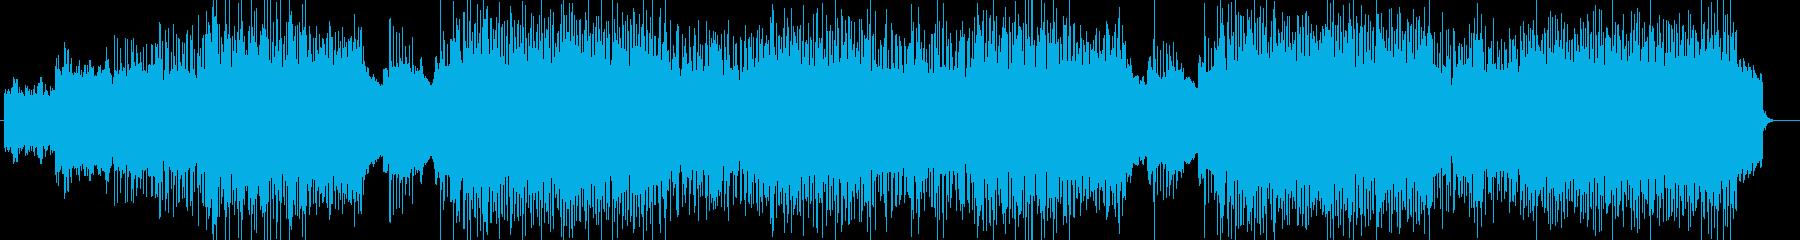 「HR/HM」「DARK」BGM197の再生済みの波形